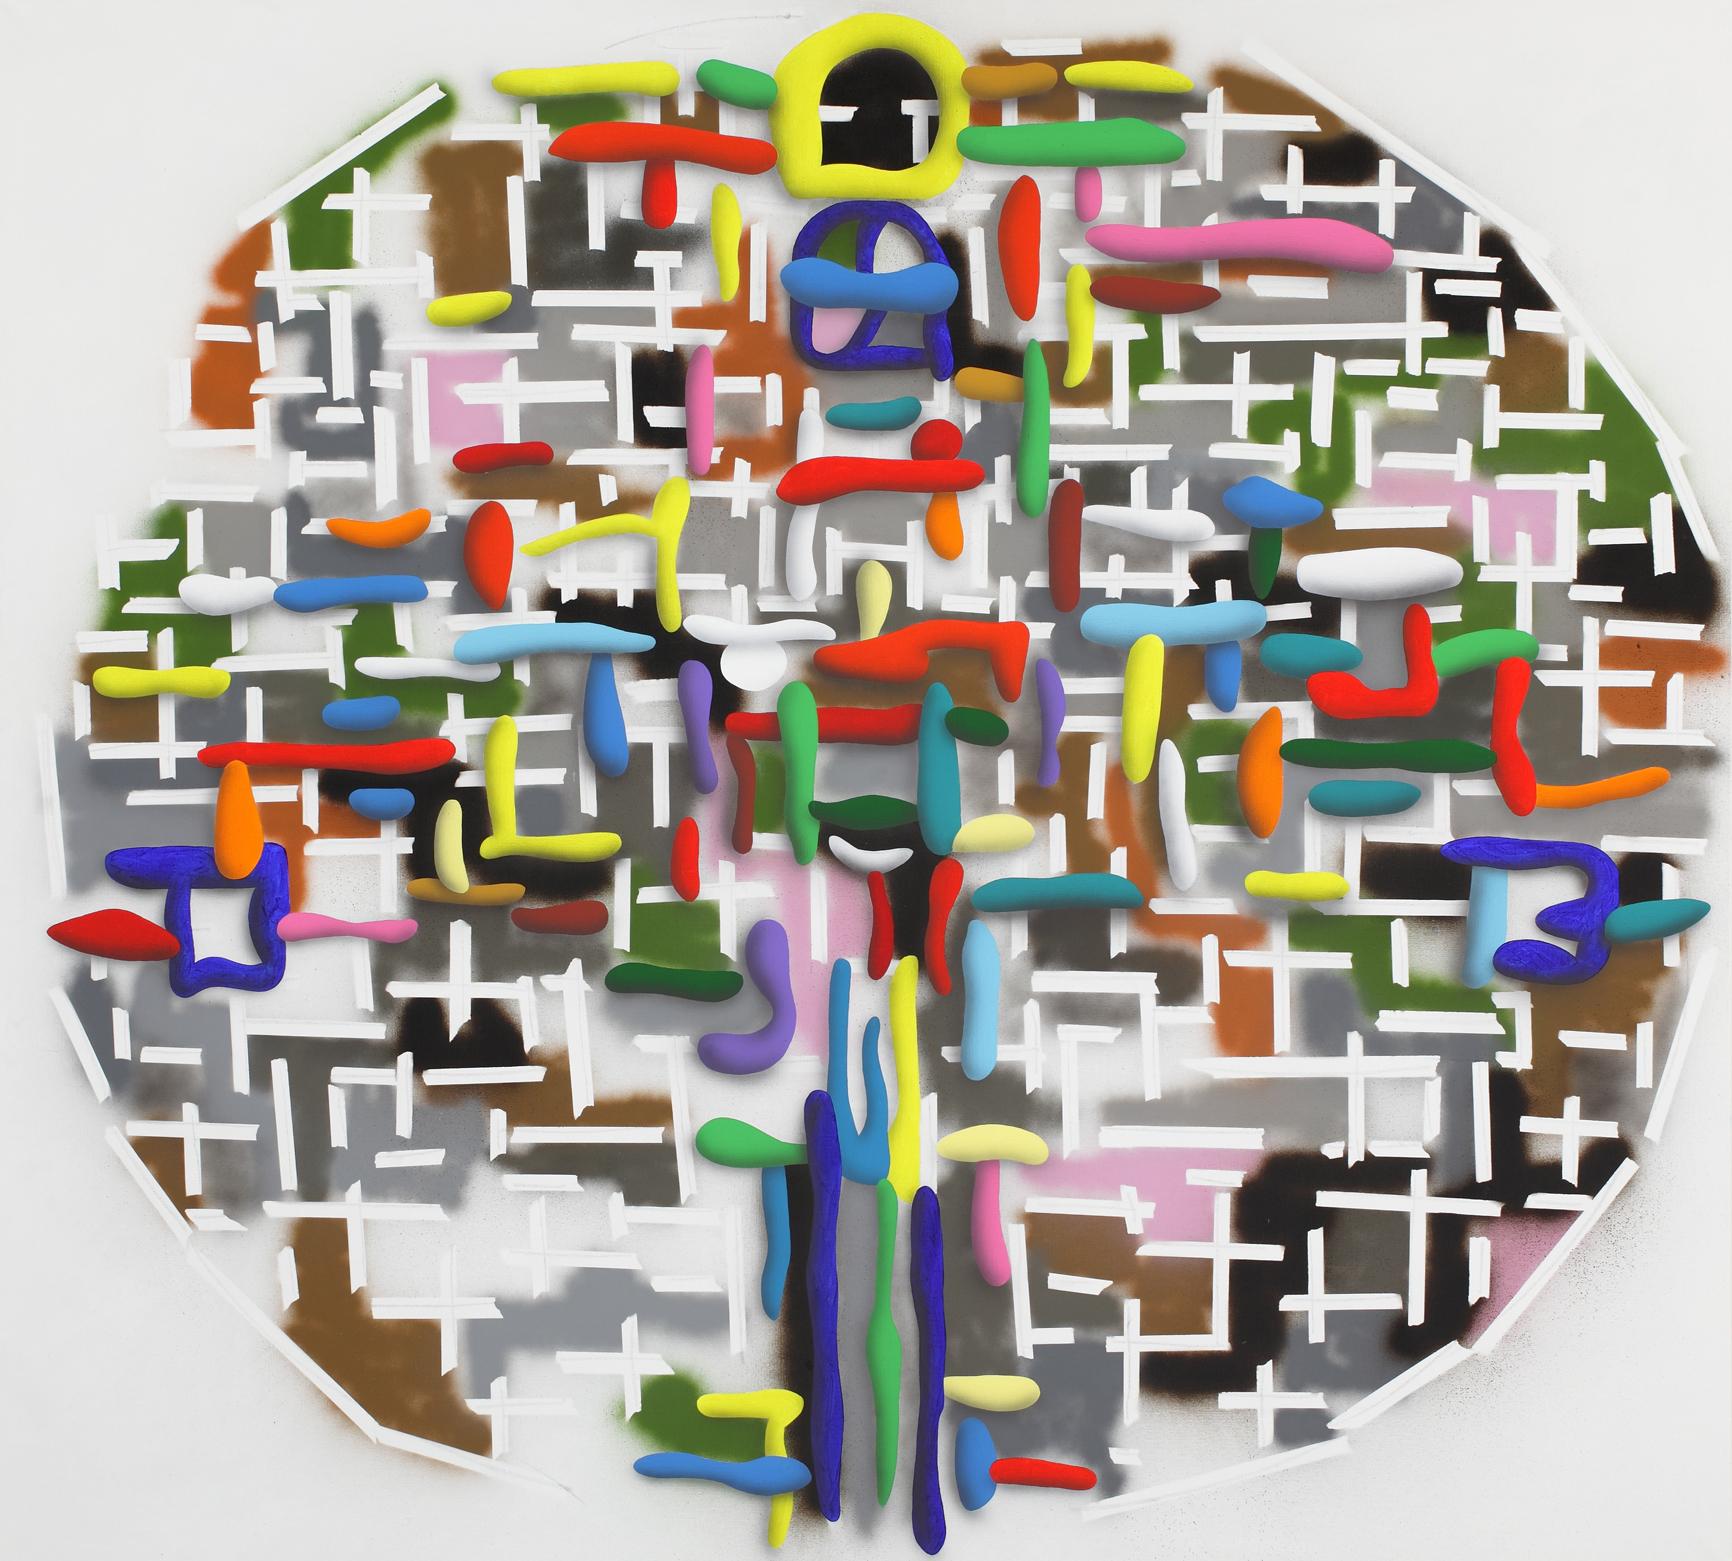 Mondrian And The One, 2010, acrylic on canvas, 180 x 200 cm